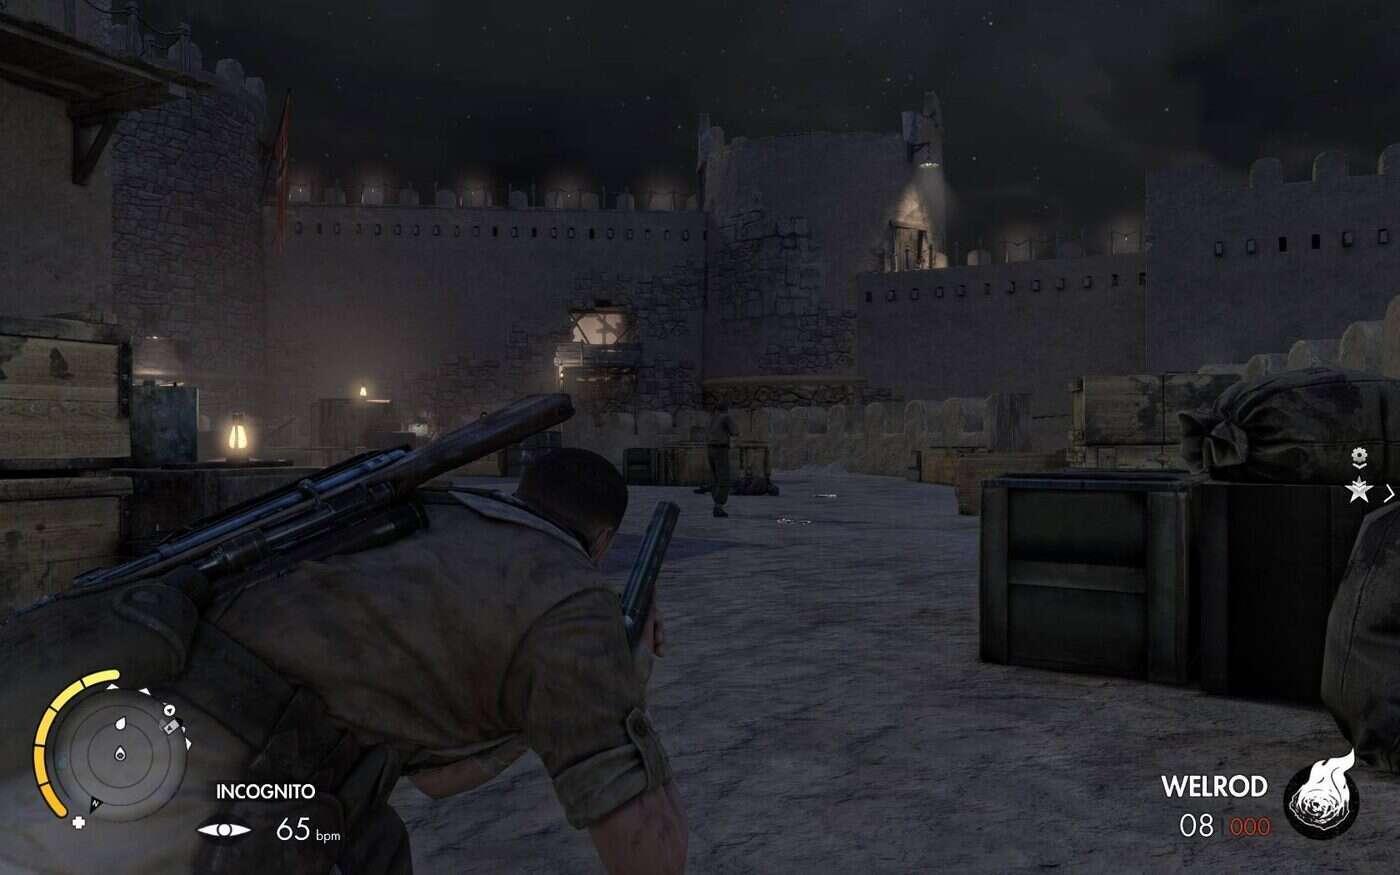 SniperElite3 2014-06-29 20-16-59-540